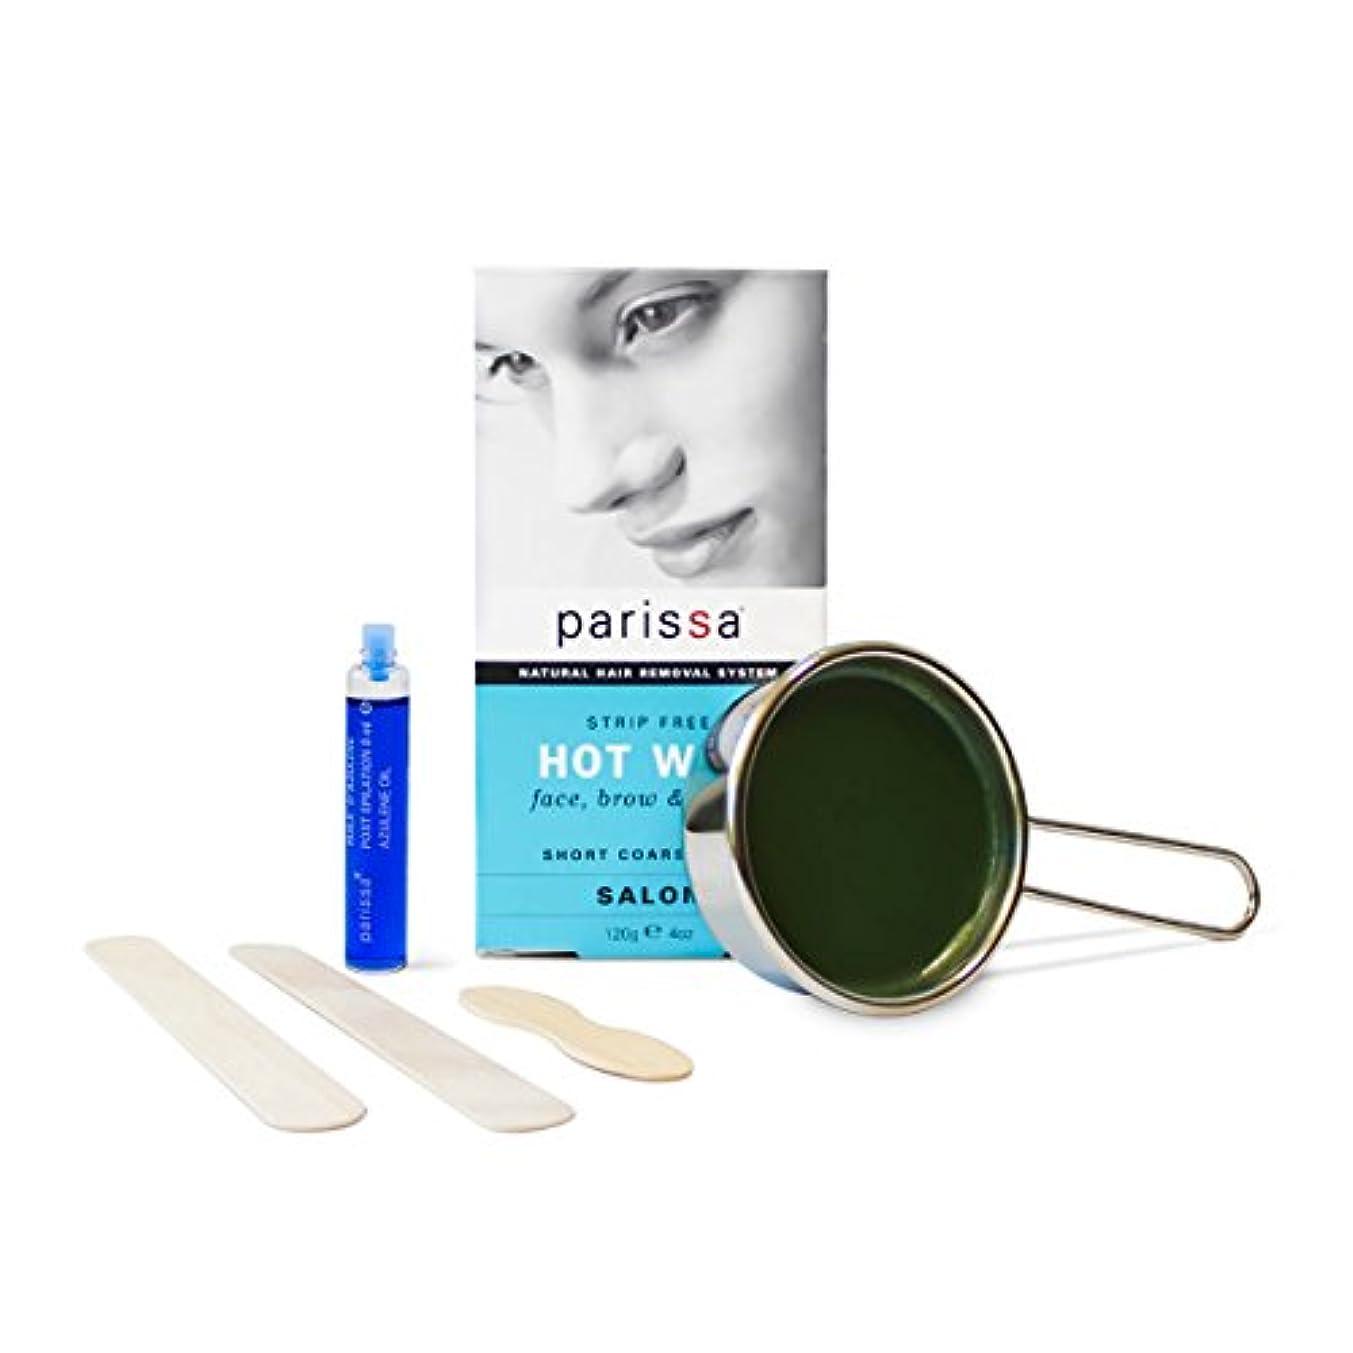 Parissa Salon Style Hot/Hard Wax, Complete Waxing Kit, Natural Hair Removal for Face, Eyebrow, Bikini areas or Brazilian waxing